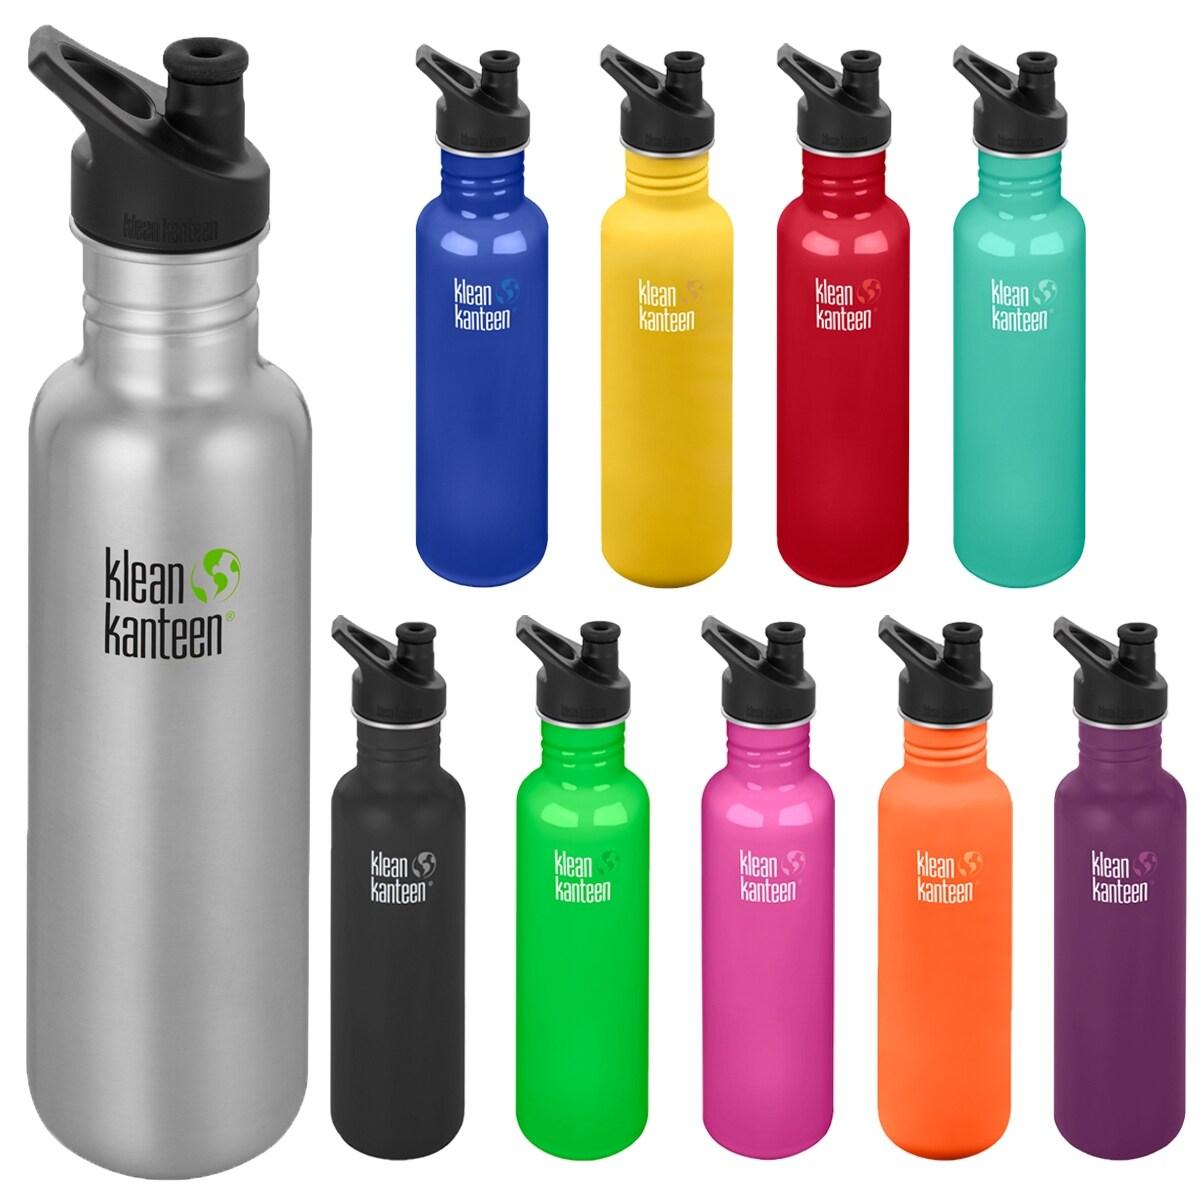 Black Loop Cap Klean Kanteen Fits All Kid Kanteen and Classic Bottles